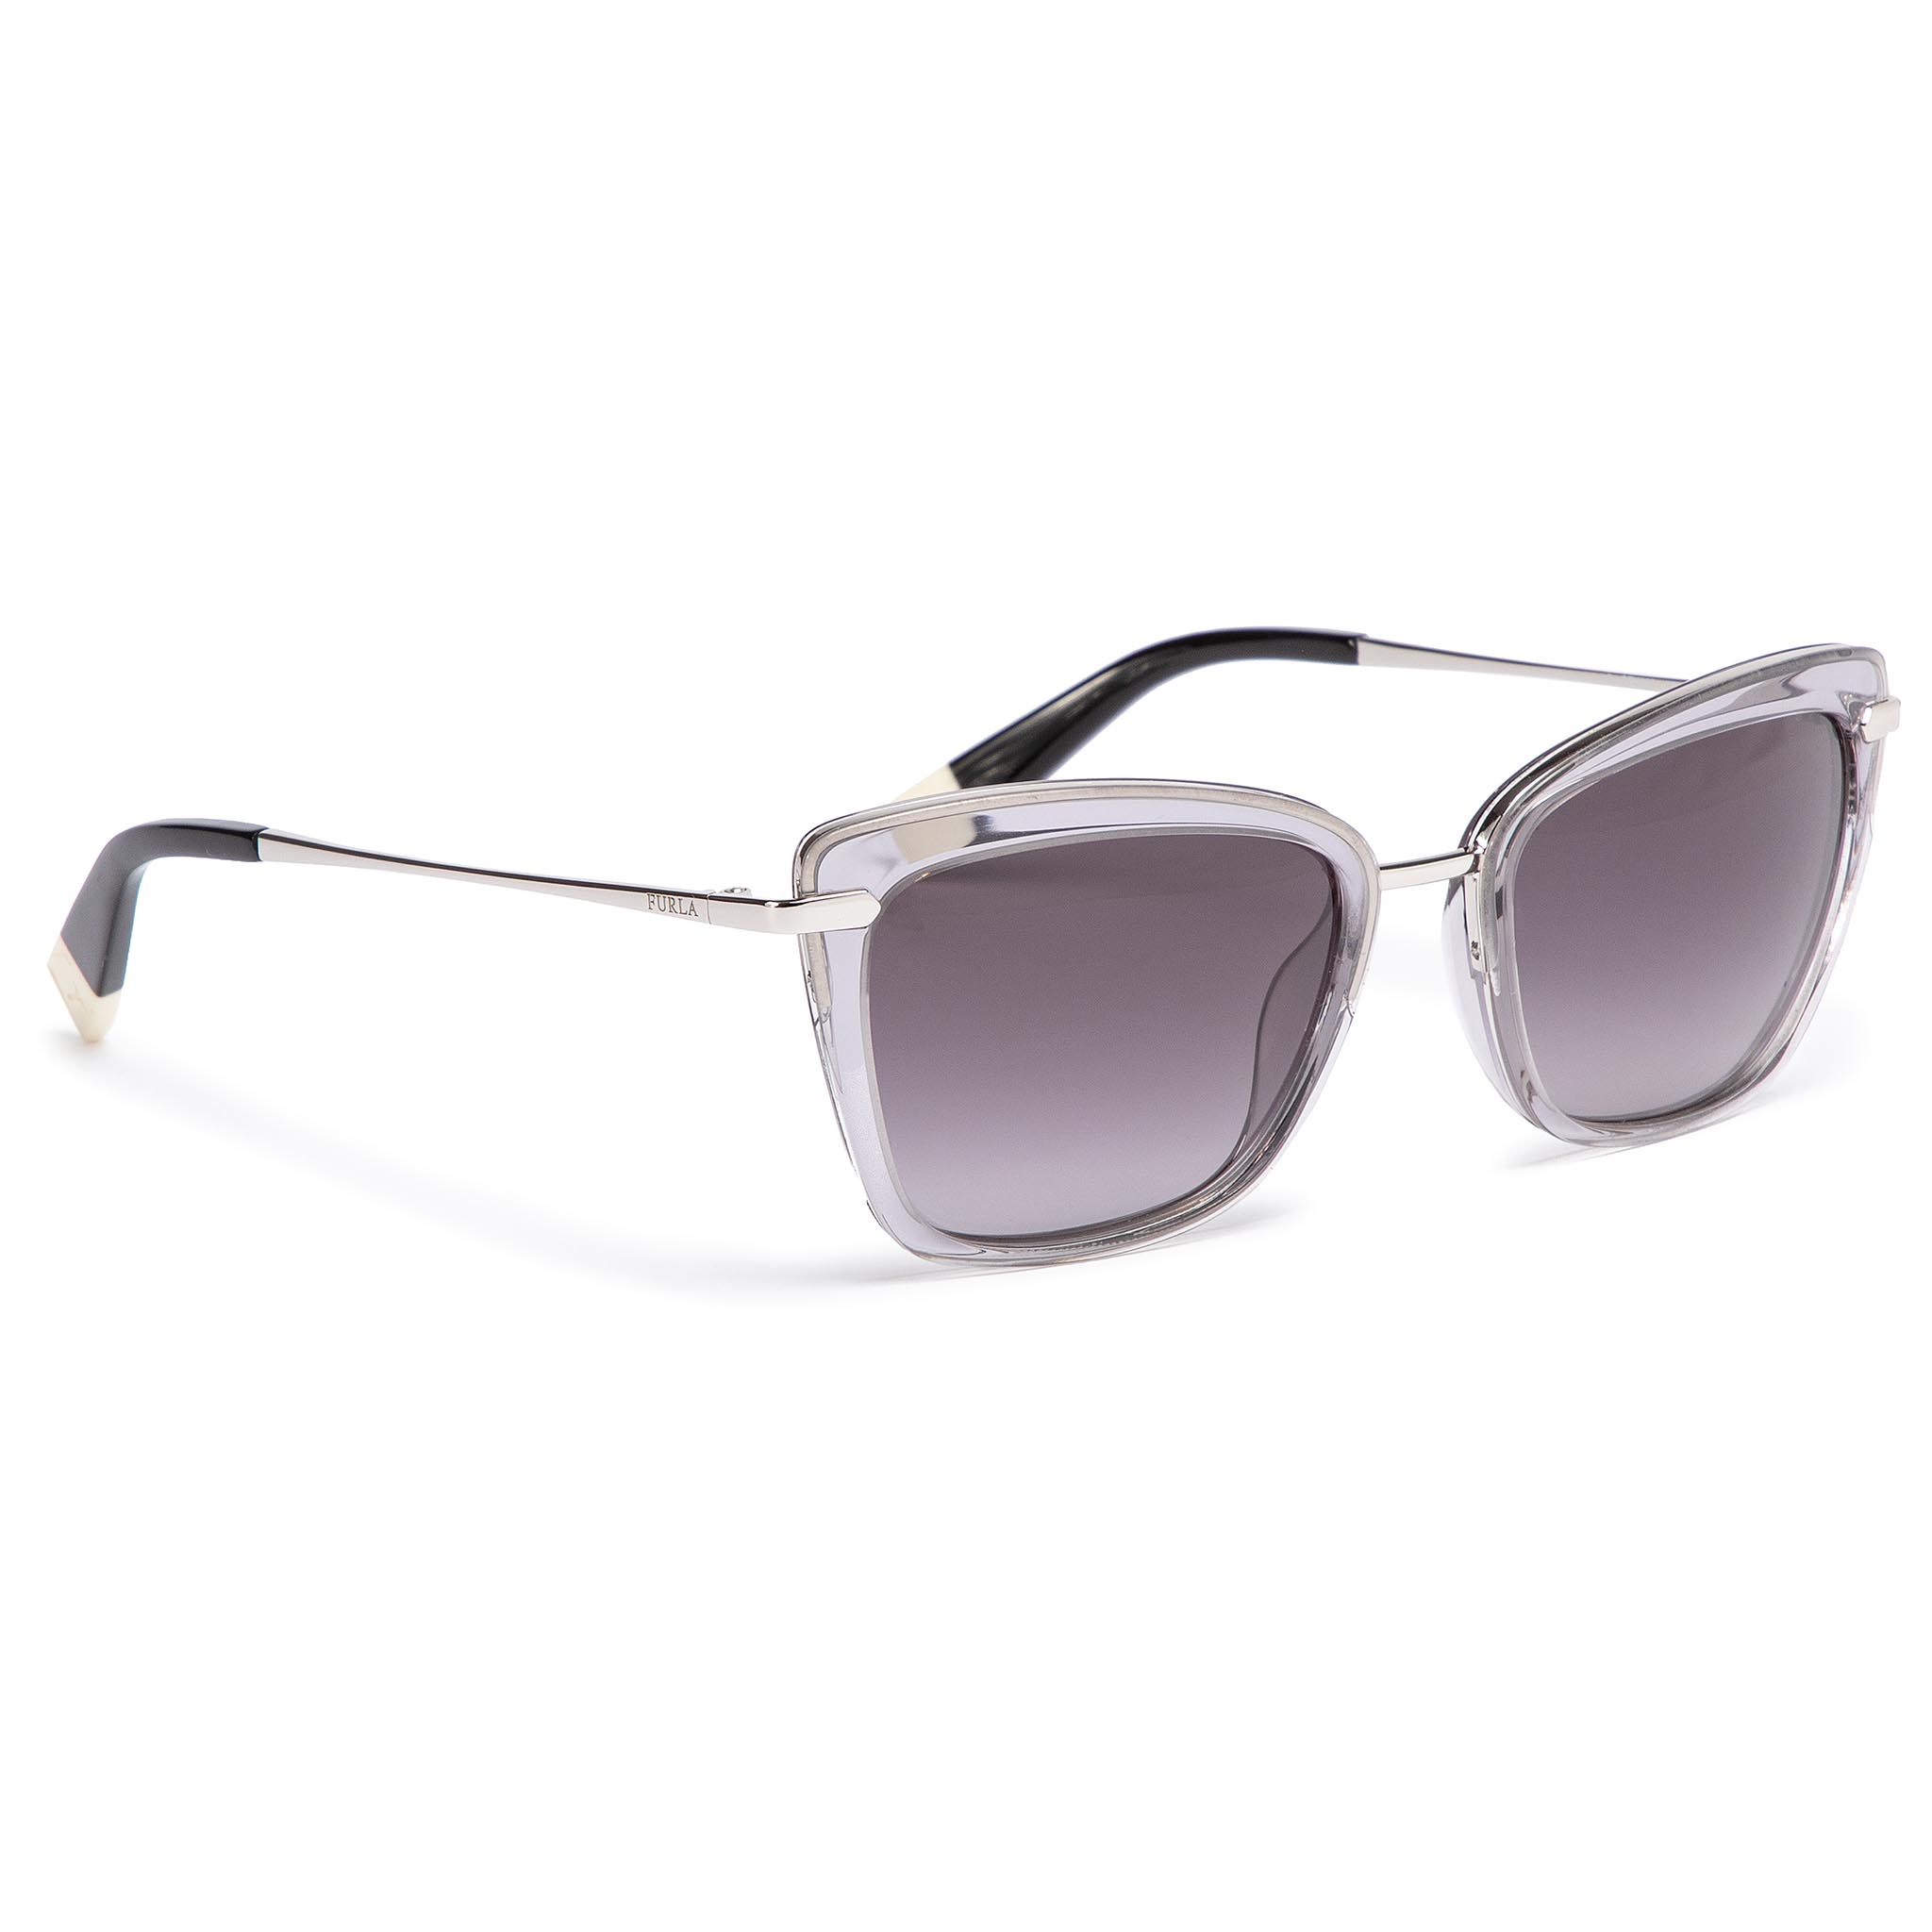 Slnečné okuliare FURLA - Elisir 919655 D 143F REM Onyx Petalo - Glami.sk 830ffa38634